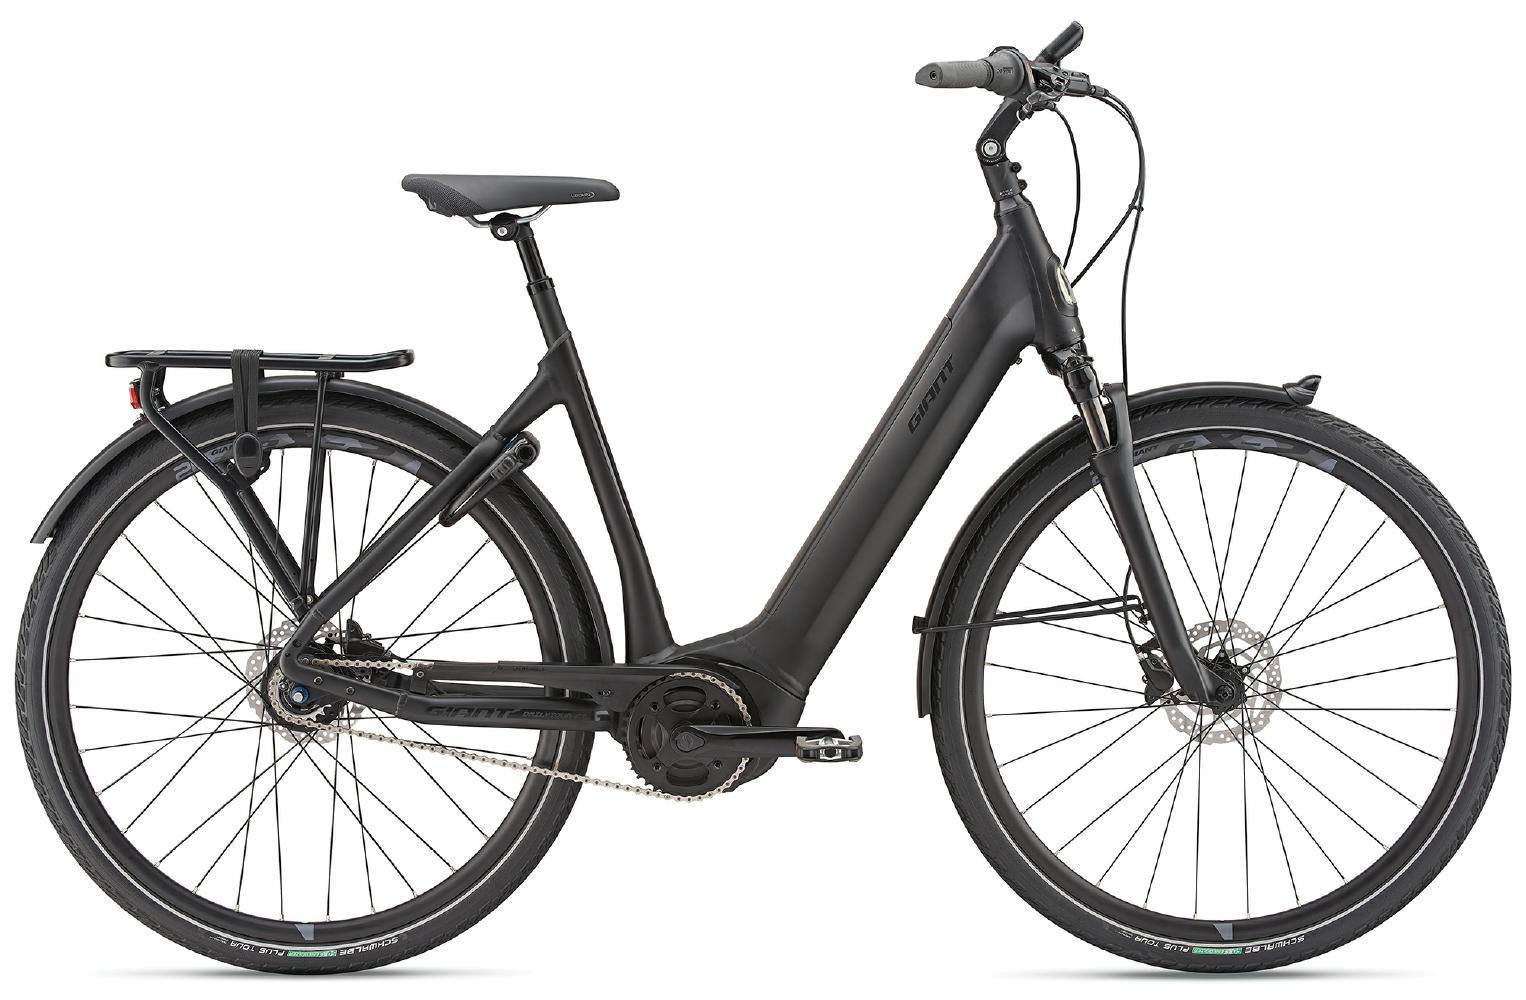 Giant Dailytour E+ 1 - LDS - Trekking e-Bike - 2019